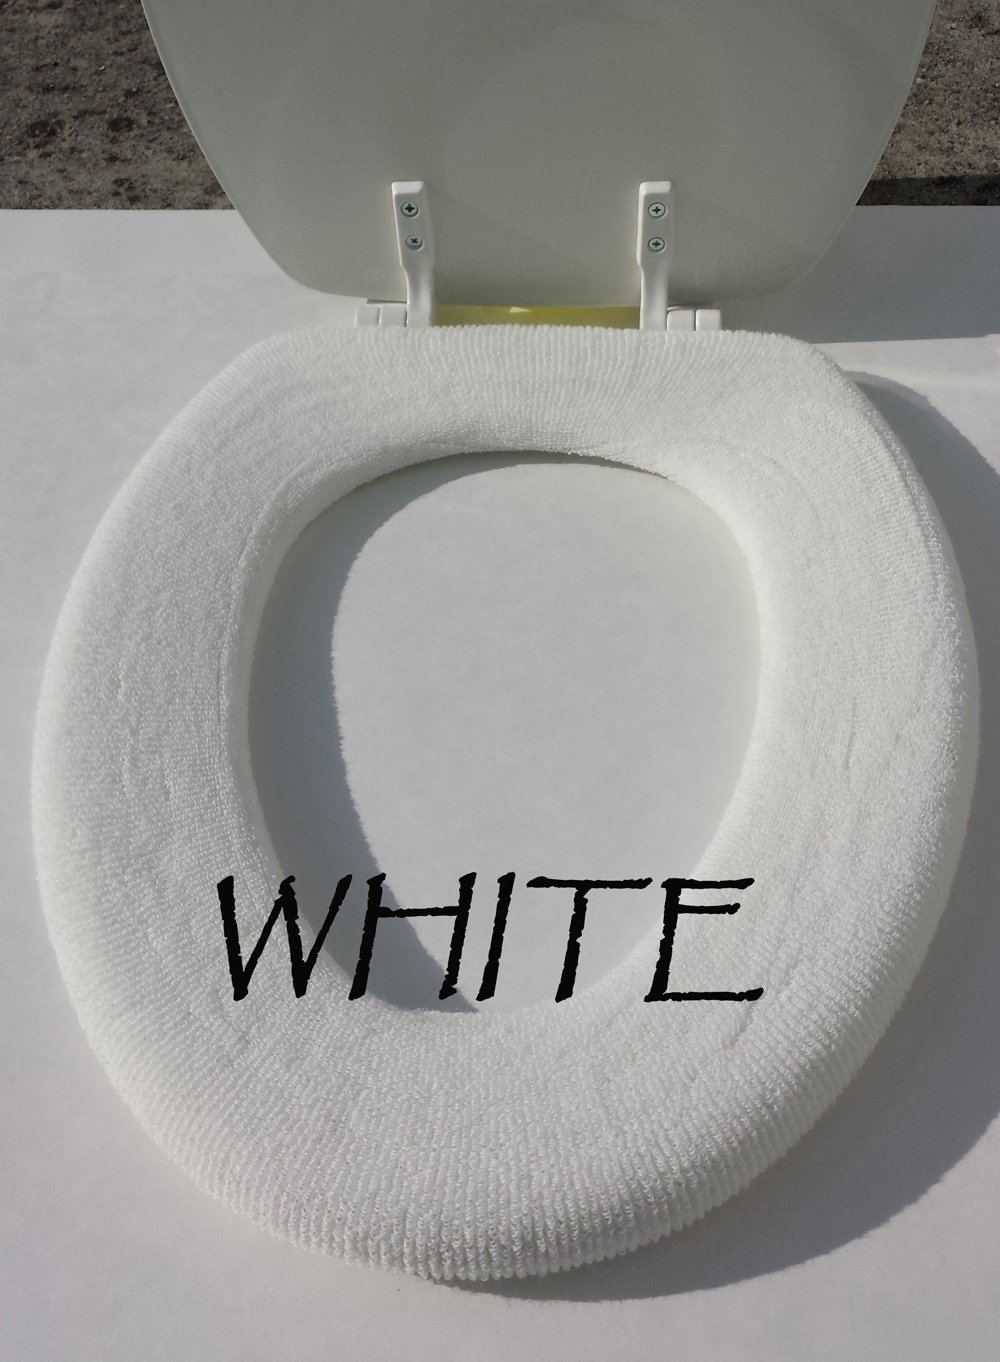 Bathroom Toilet Seat Warmer Cover Washable- White - LifeLong Needs